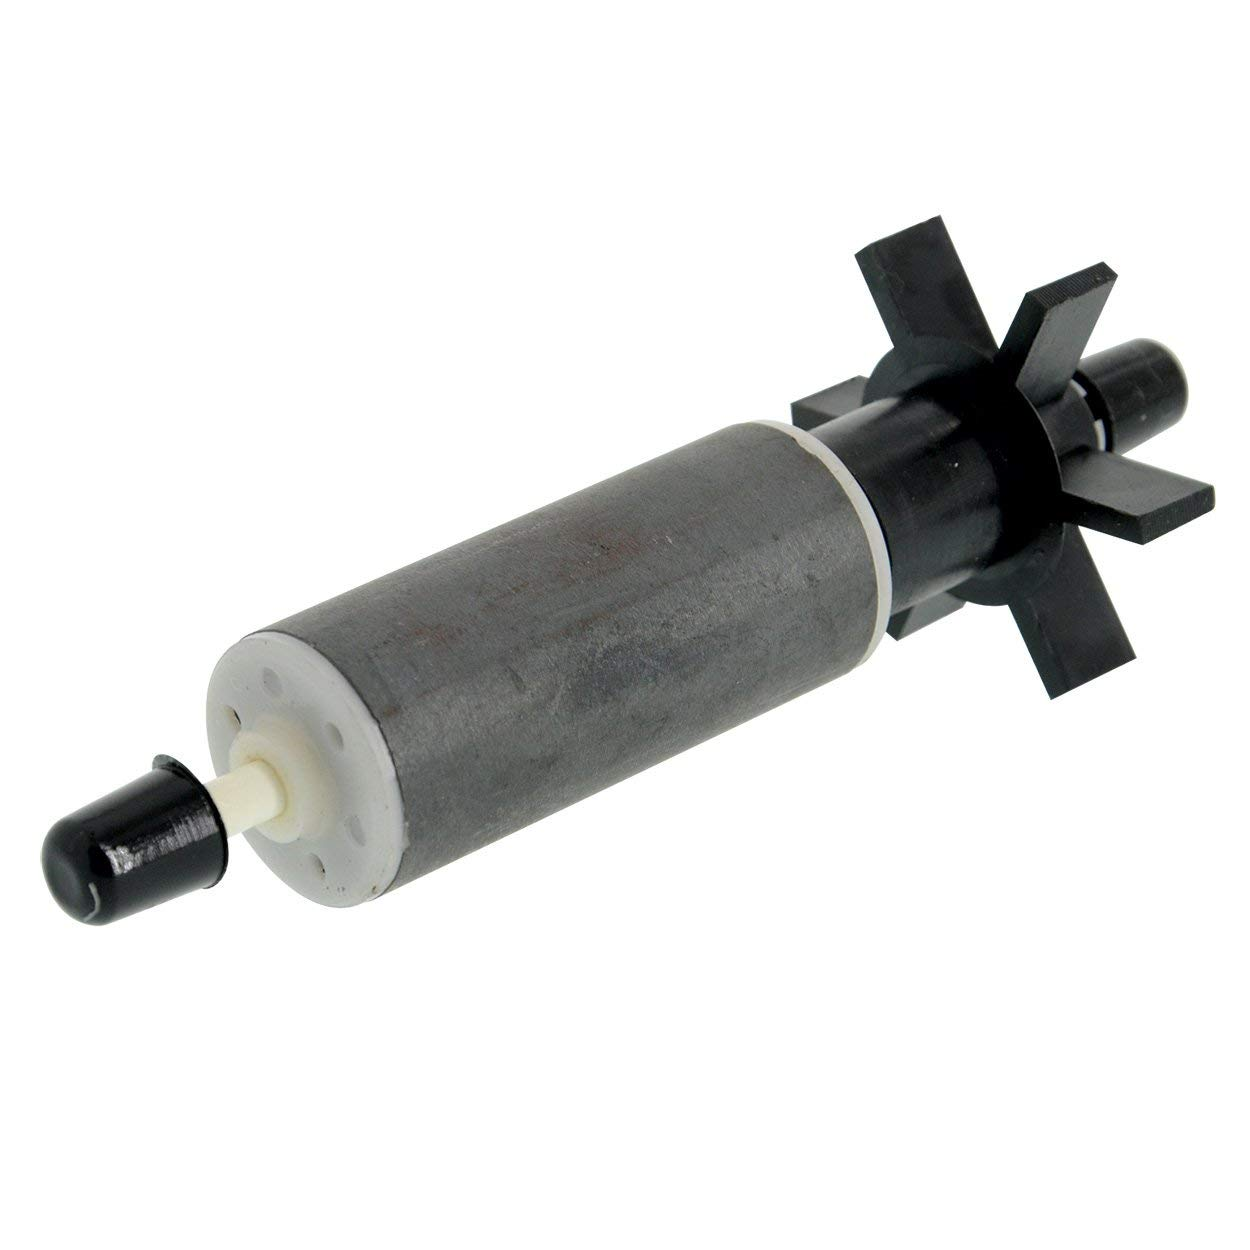 Aquascape Pump Remote - Aquascape Ideas